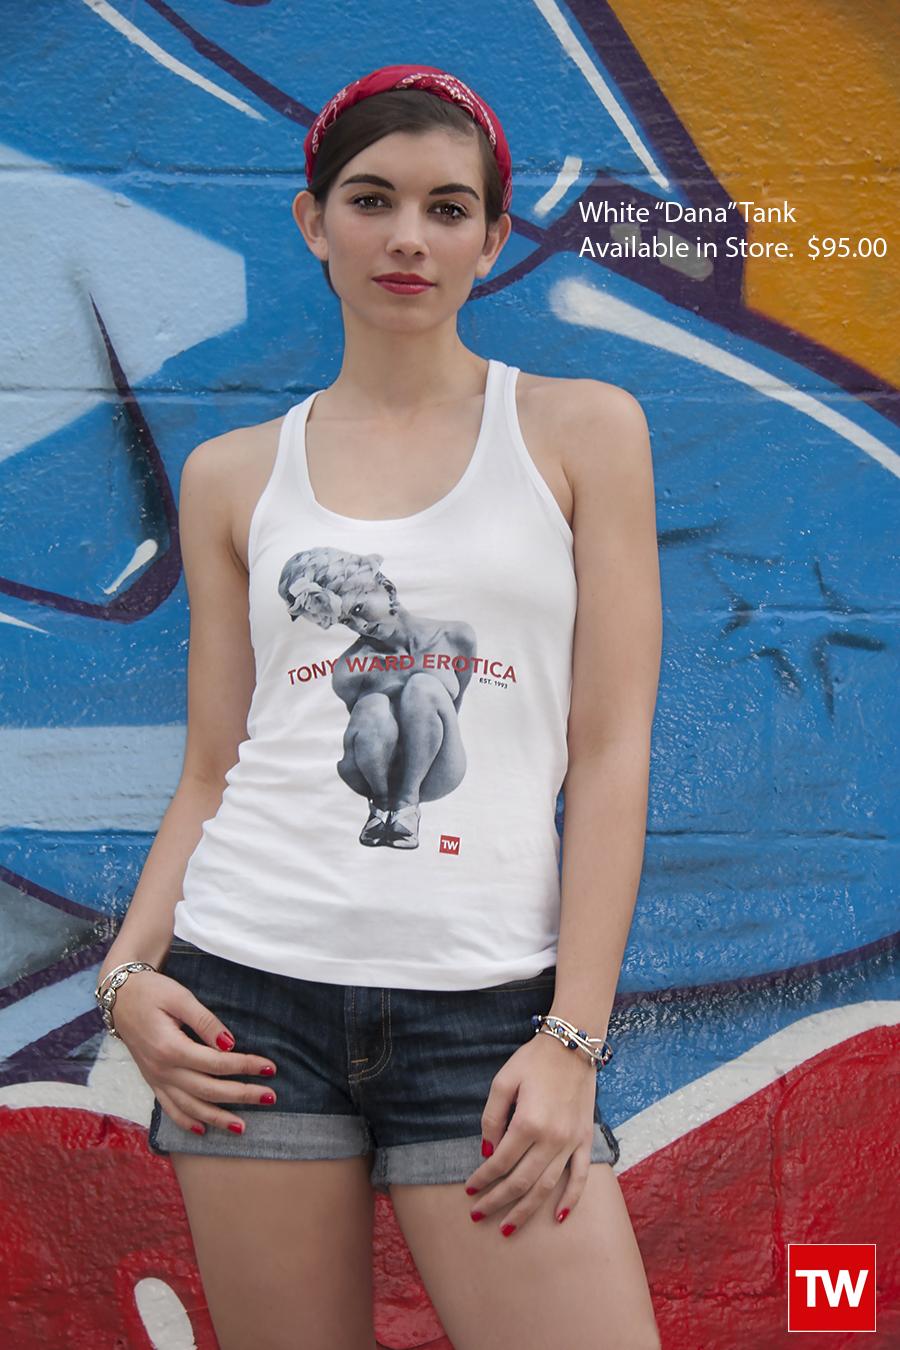 Tony_Ward_Studio_e_commerce_store_t-shirts_white_dana_tank_sale_model_Kathryn